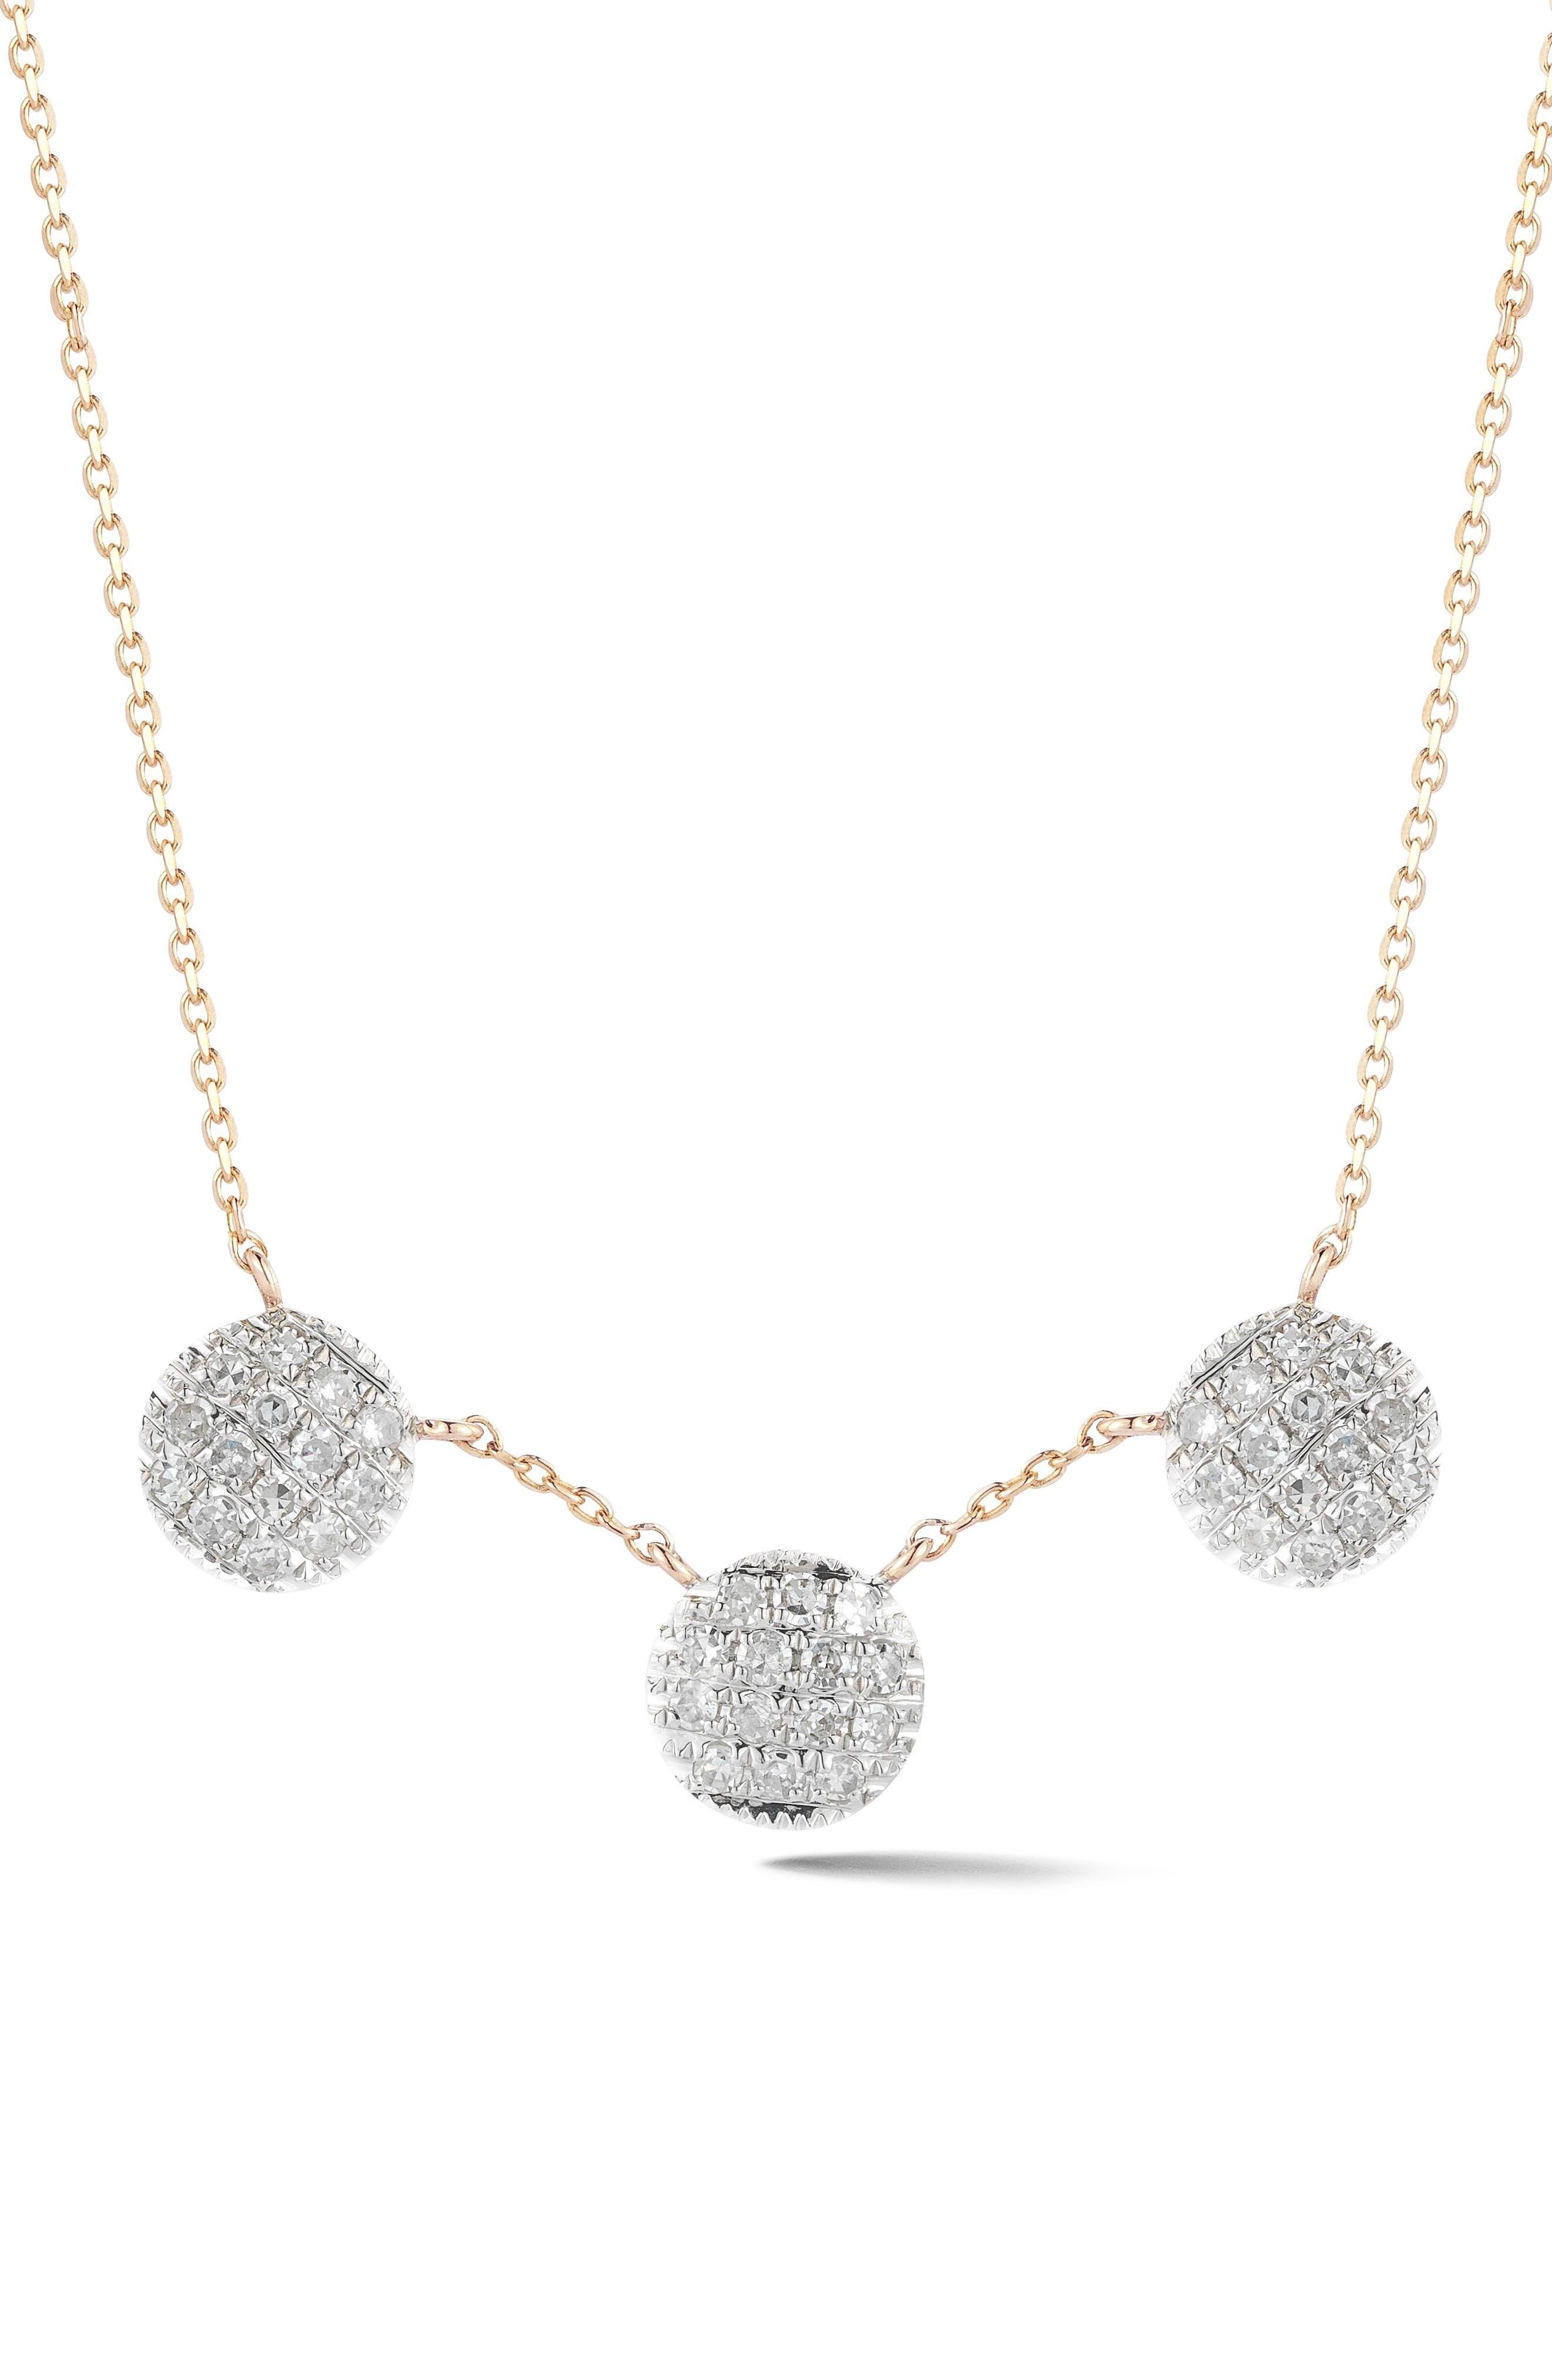 Main Image - Dana Rebecca Designs Lauren Joy Three-Disc Diamond Necklace